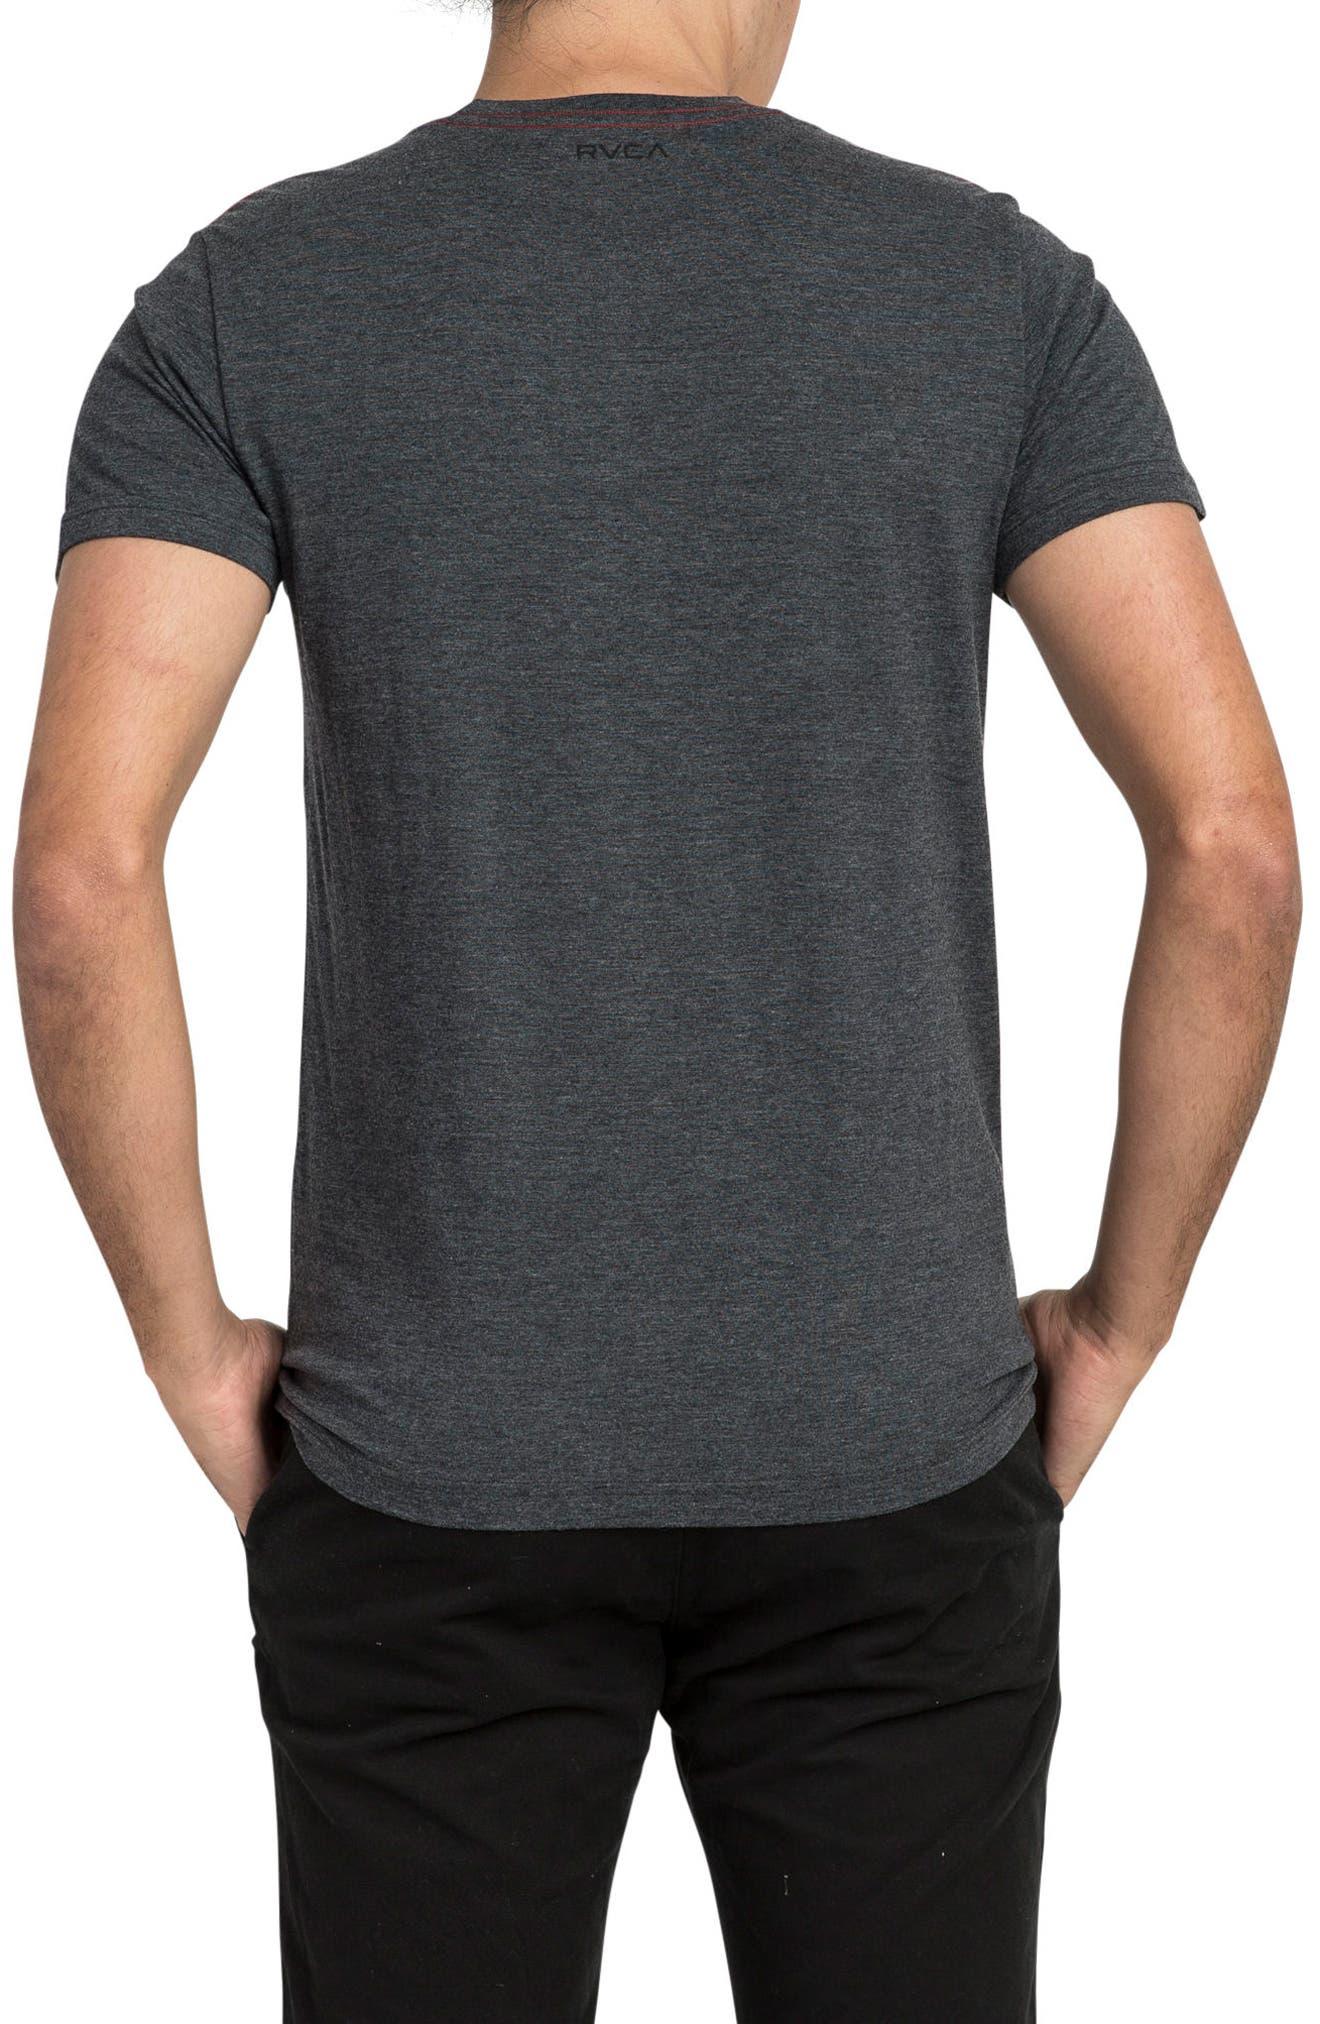 Co Brand Logo Graphic T-Shirt,                             Alternate thumbnail 2, color,                             Rvca Black